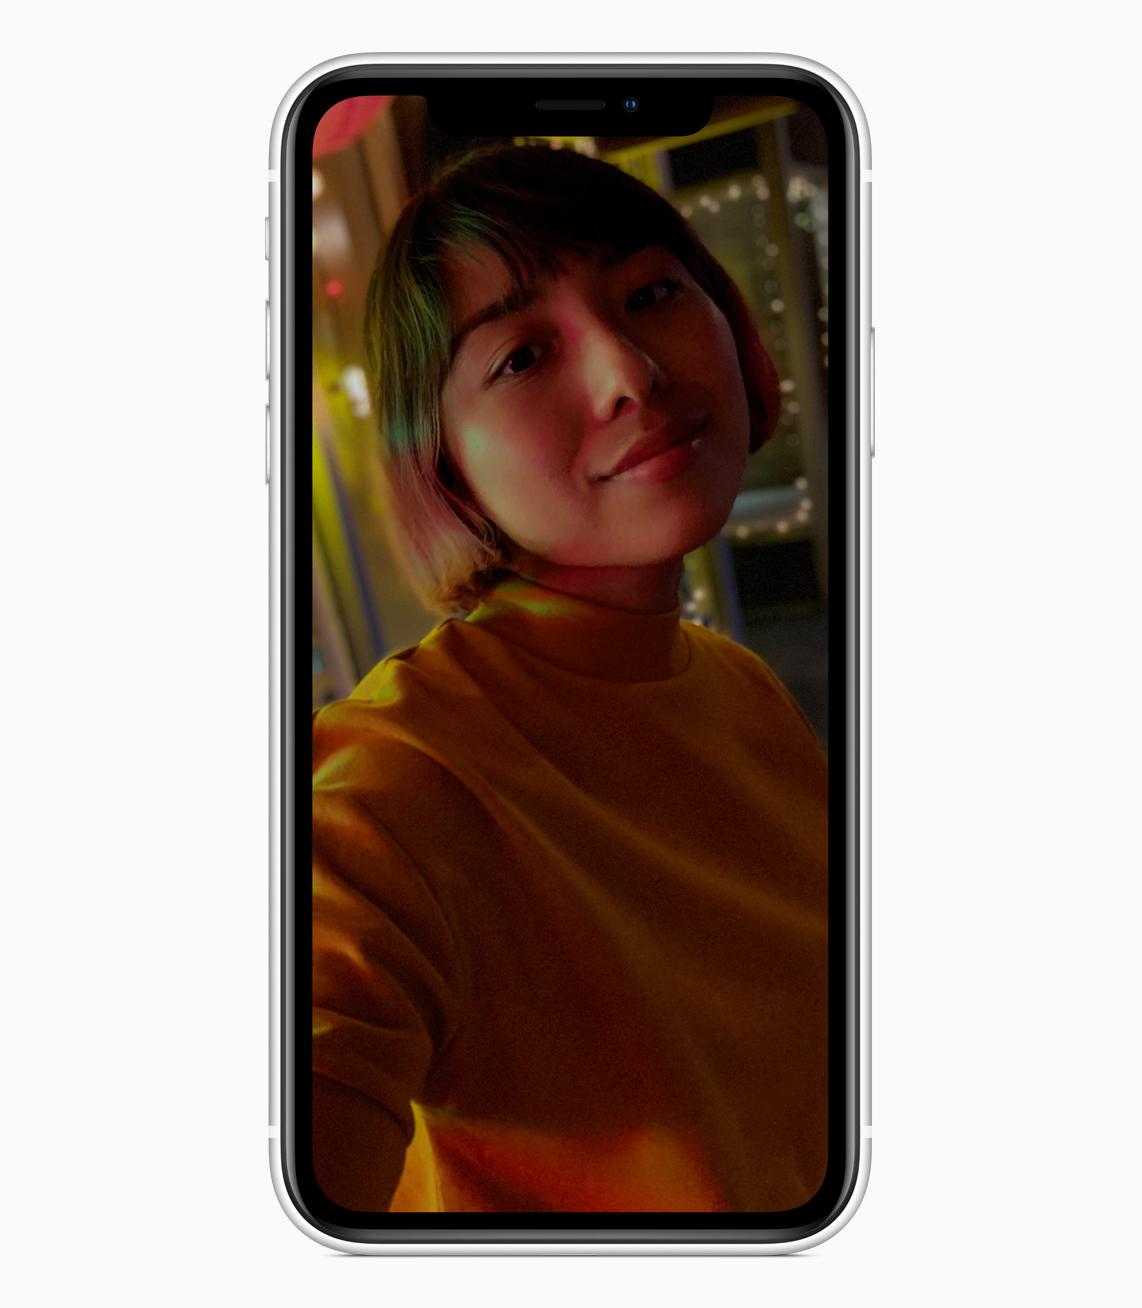 iphone_xr_portrait-white_09122018